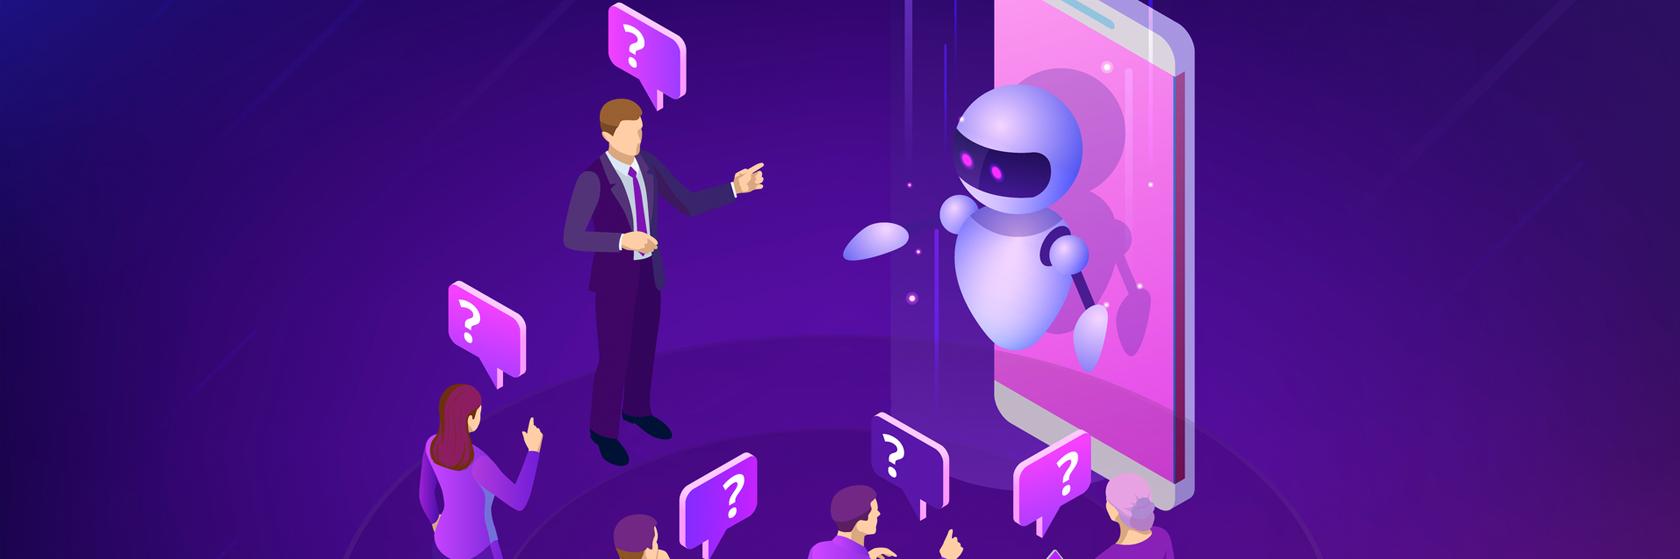 Financial ChatBot